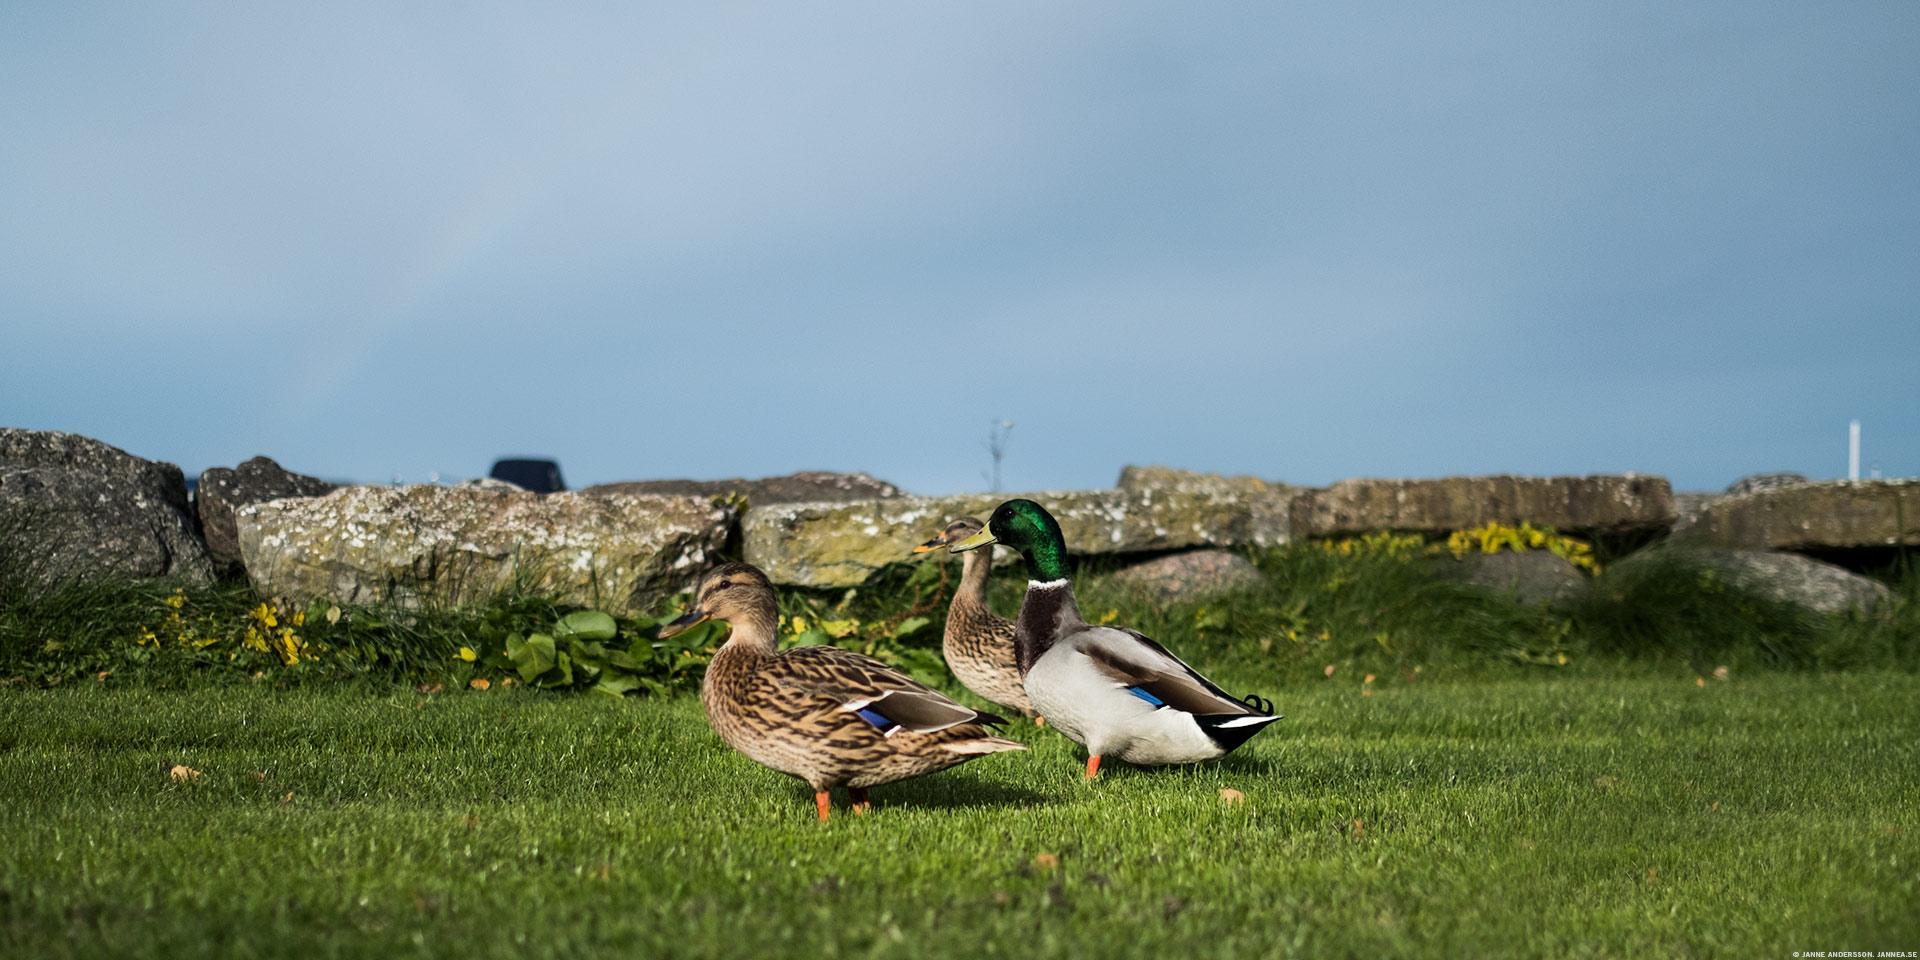 Quack – Gräsänder på gräs | © Janne A